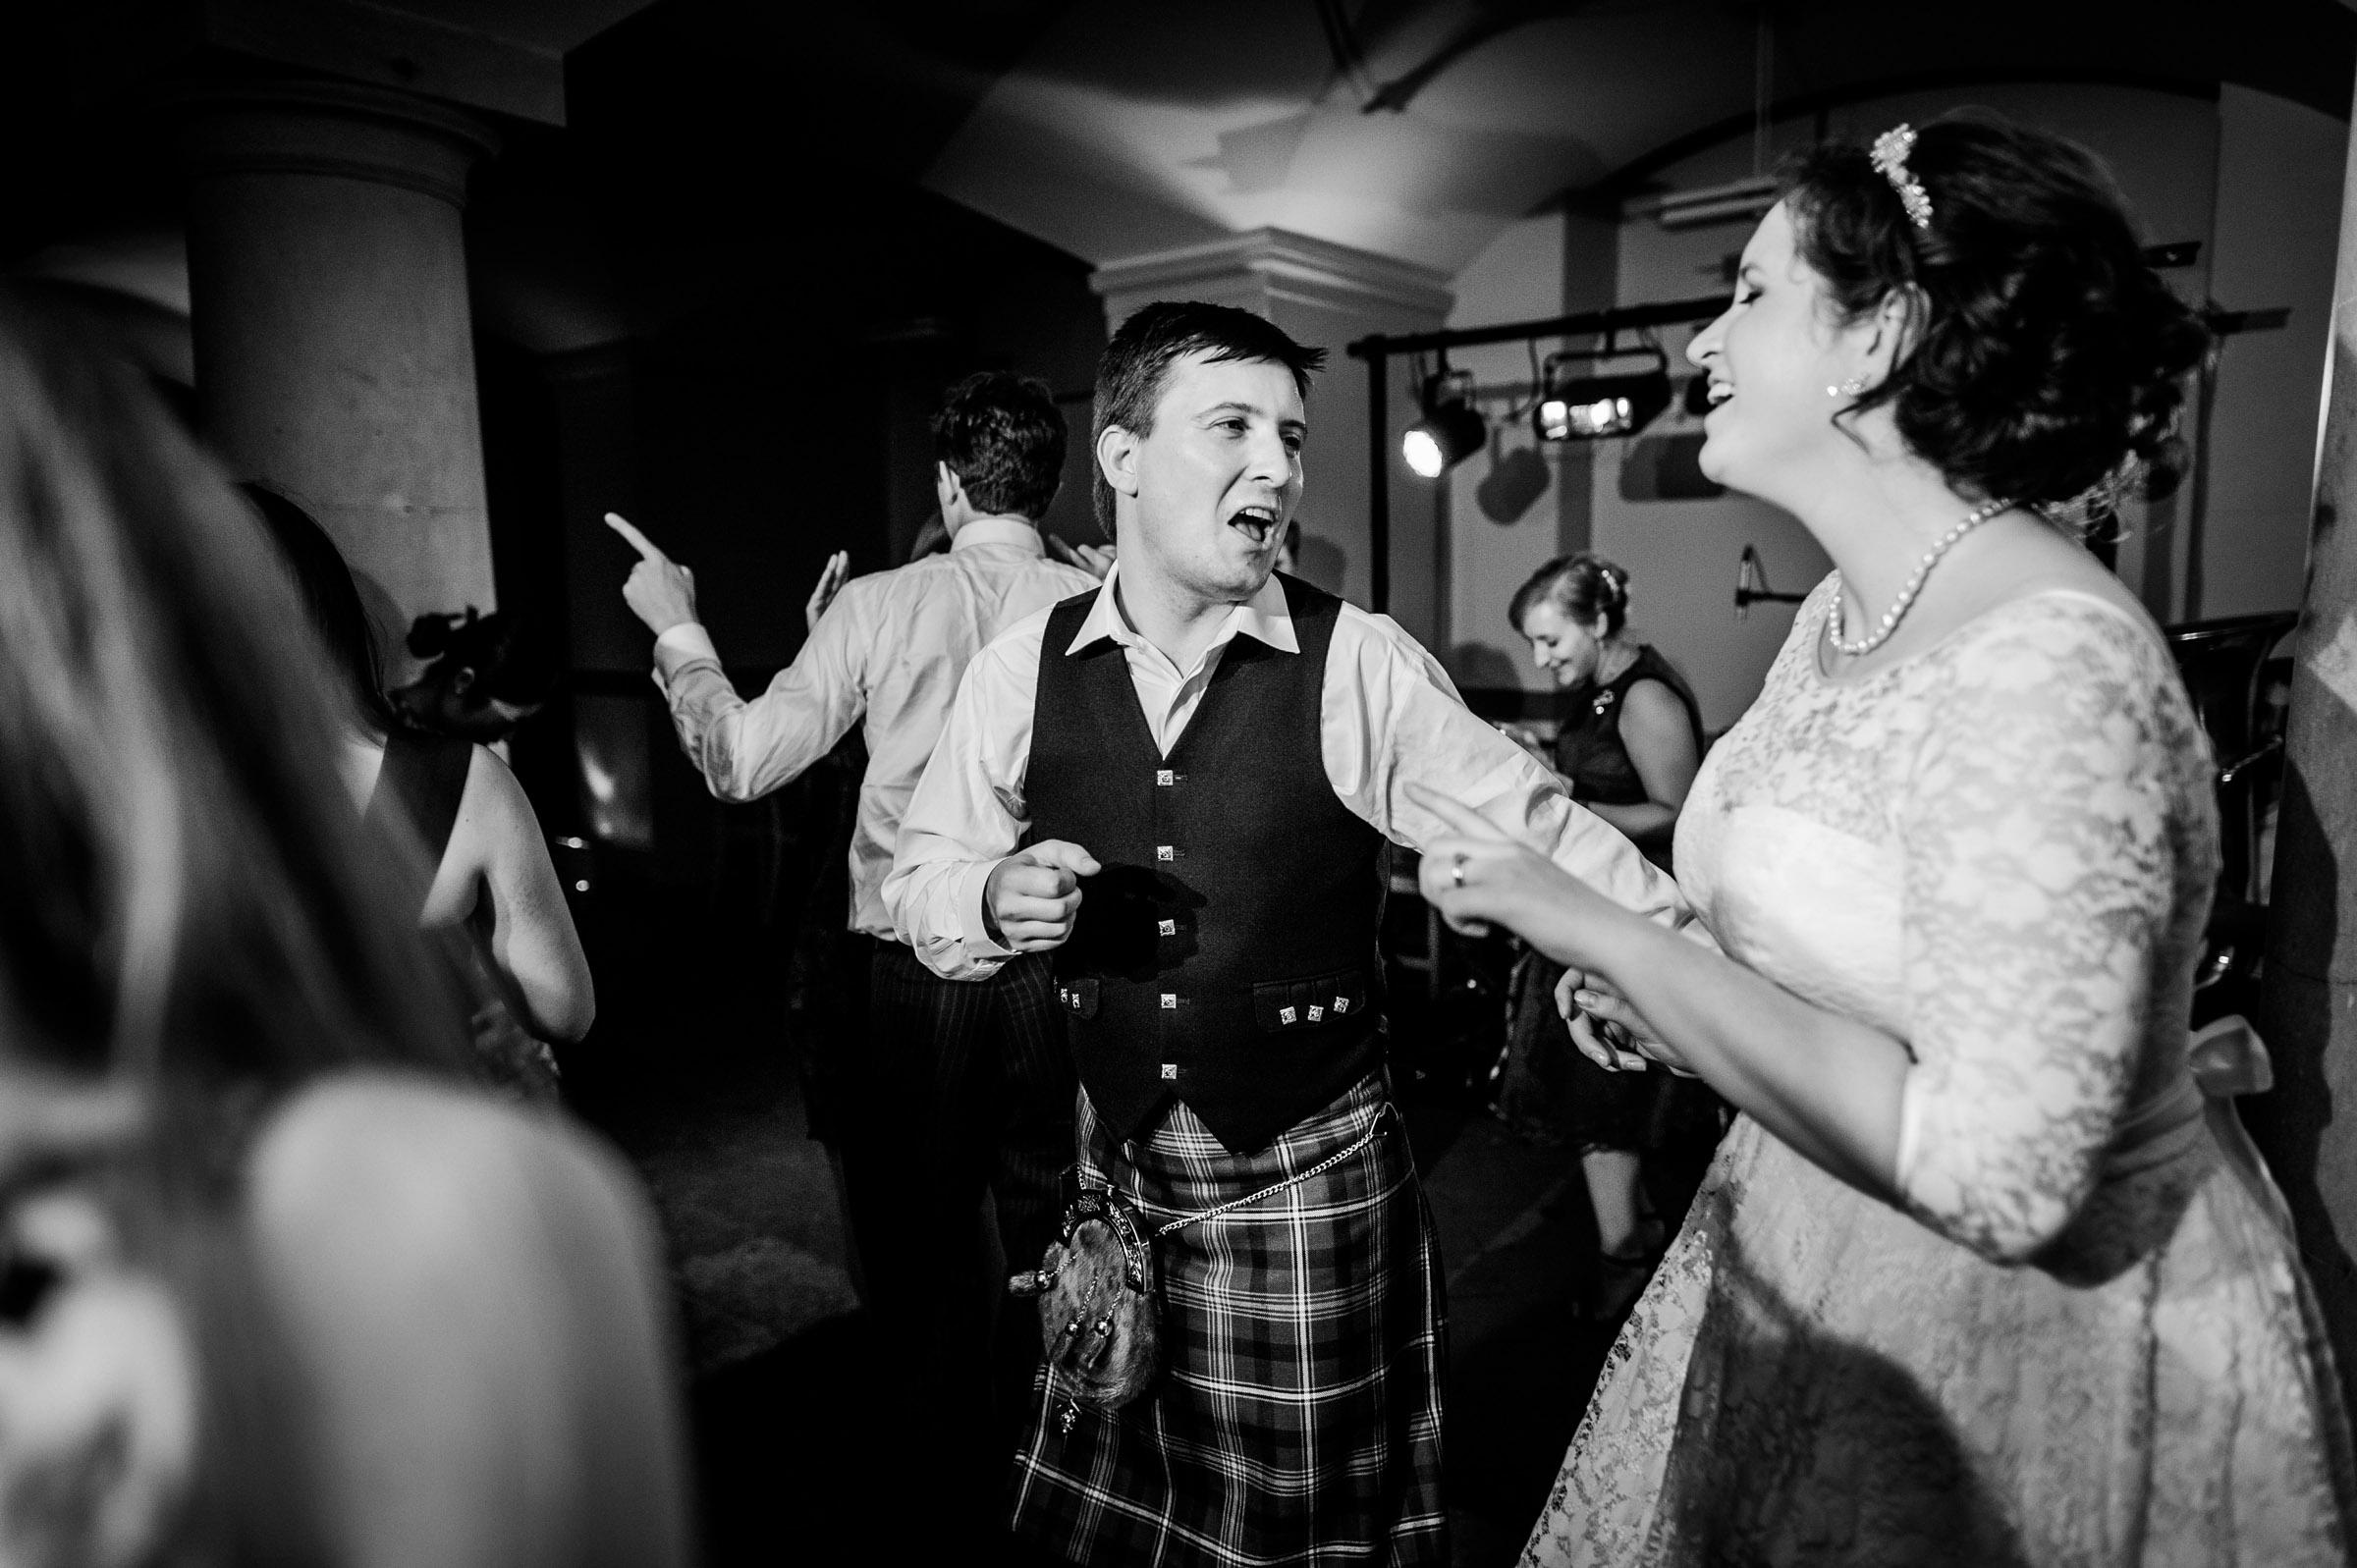 Ashmolean-Museum-Wedding-Pictures-0075.jpg